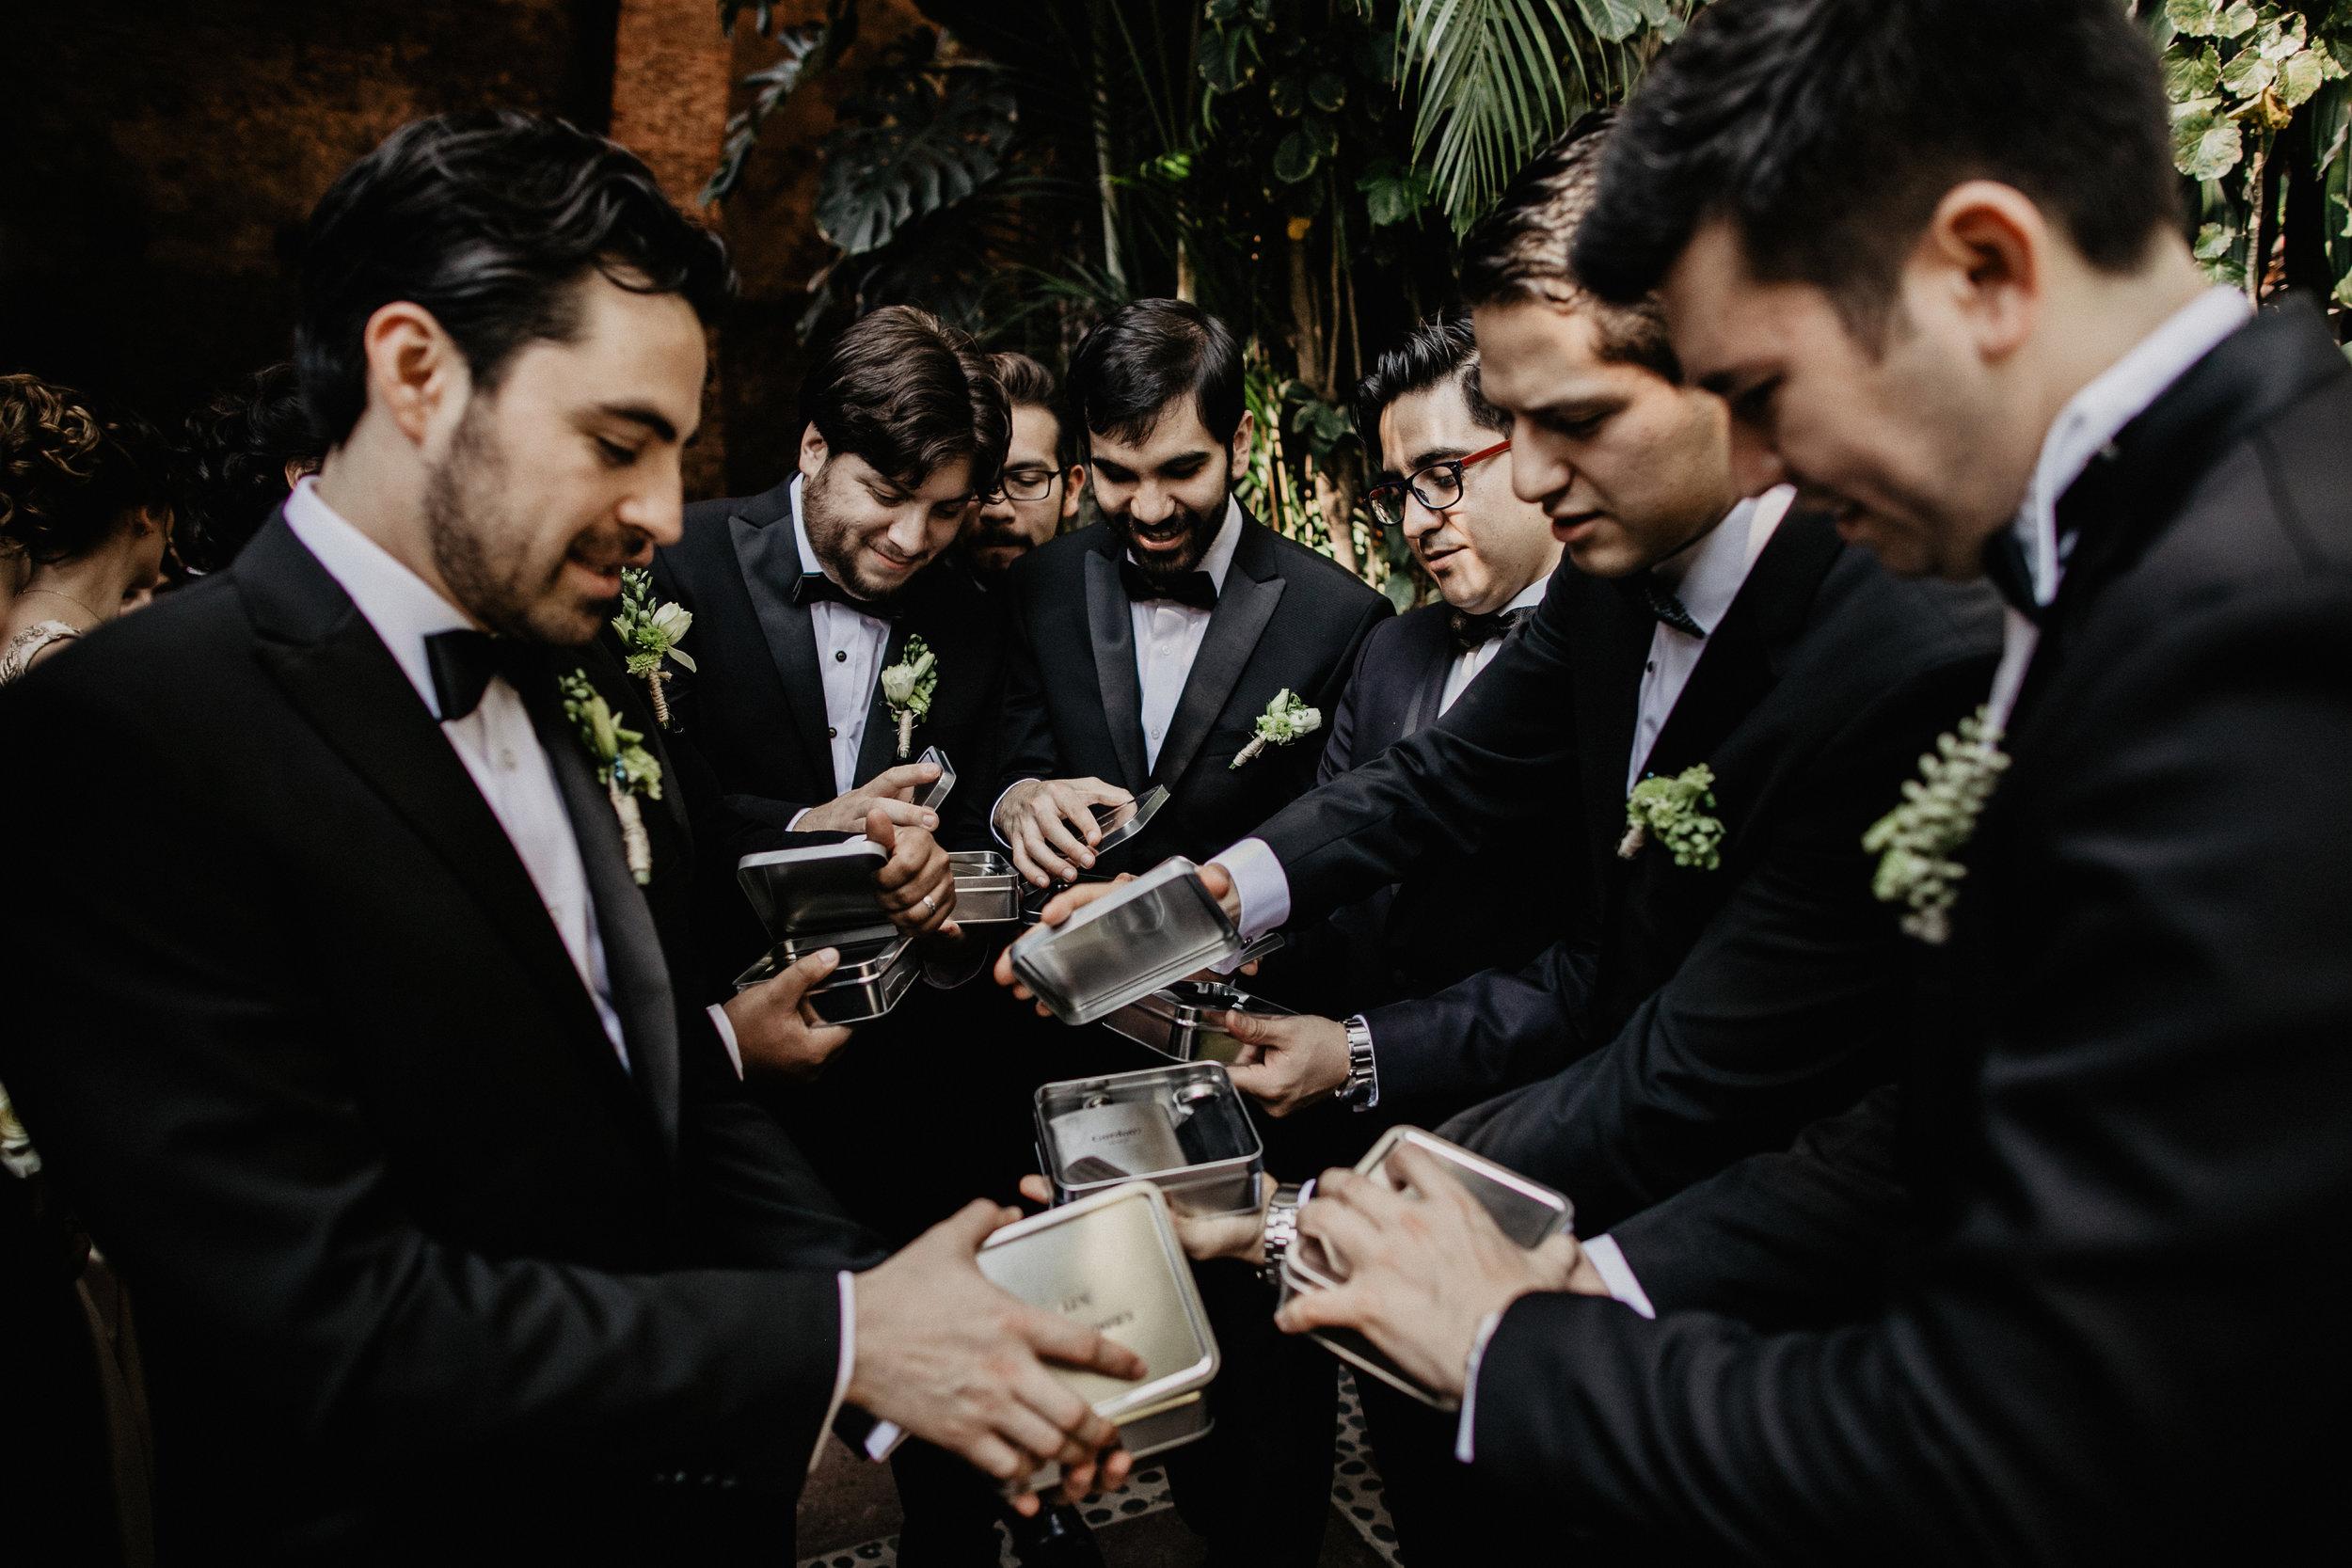 Alfonso_flores_destination_wedding_photography_vanesa_carlos-396.JPG